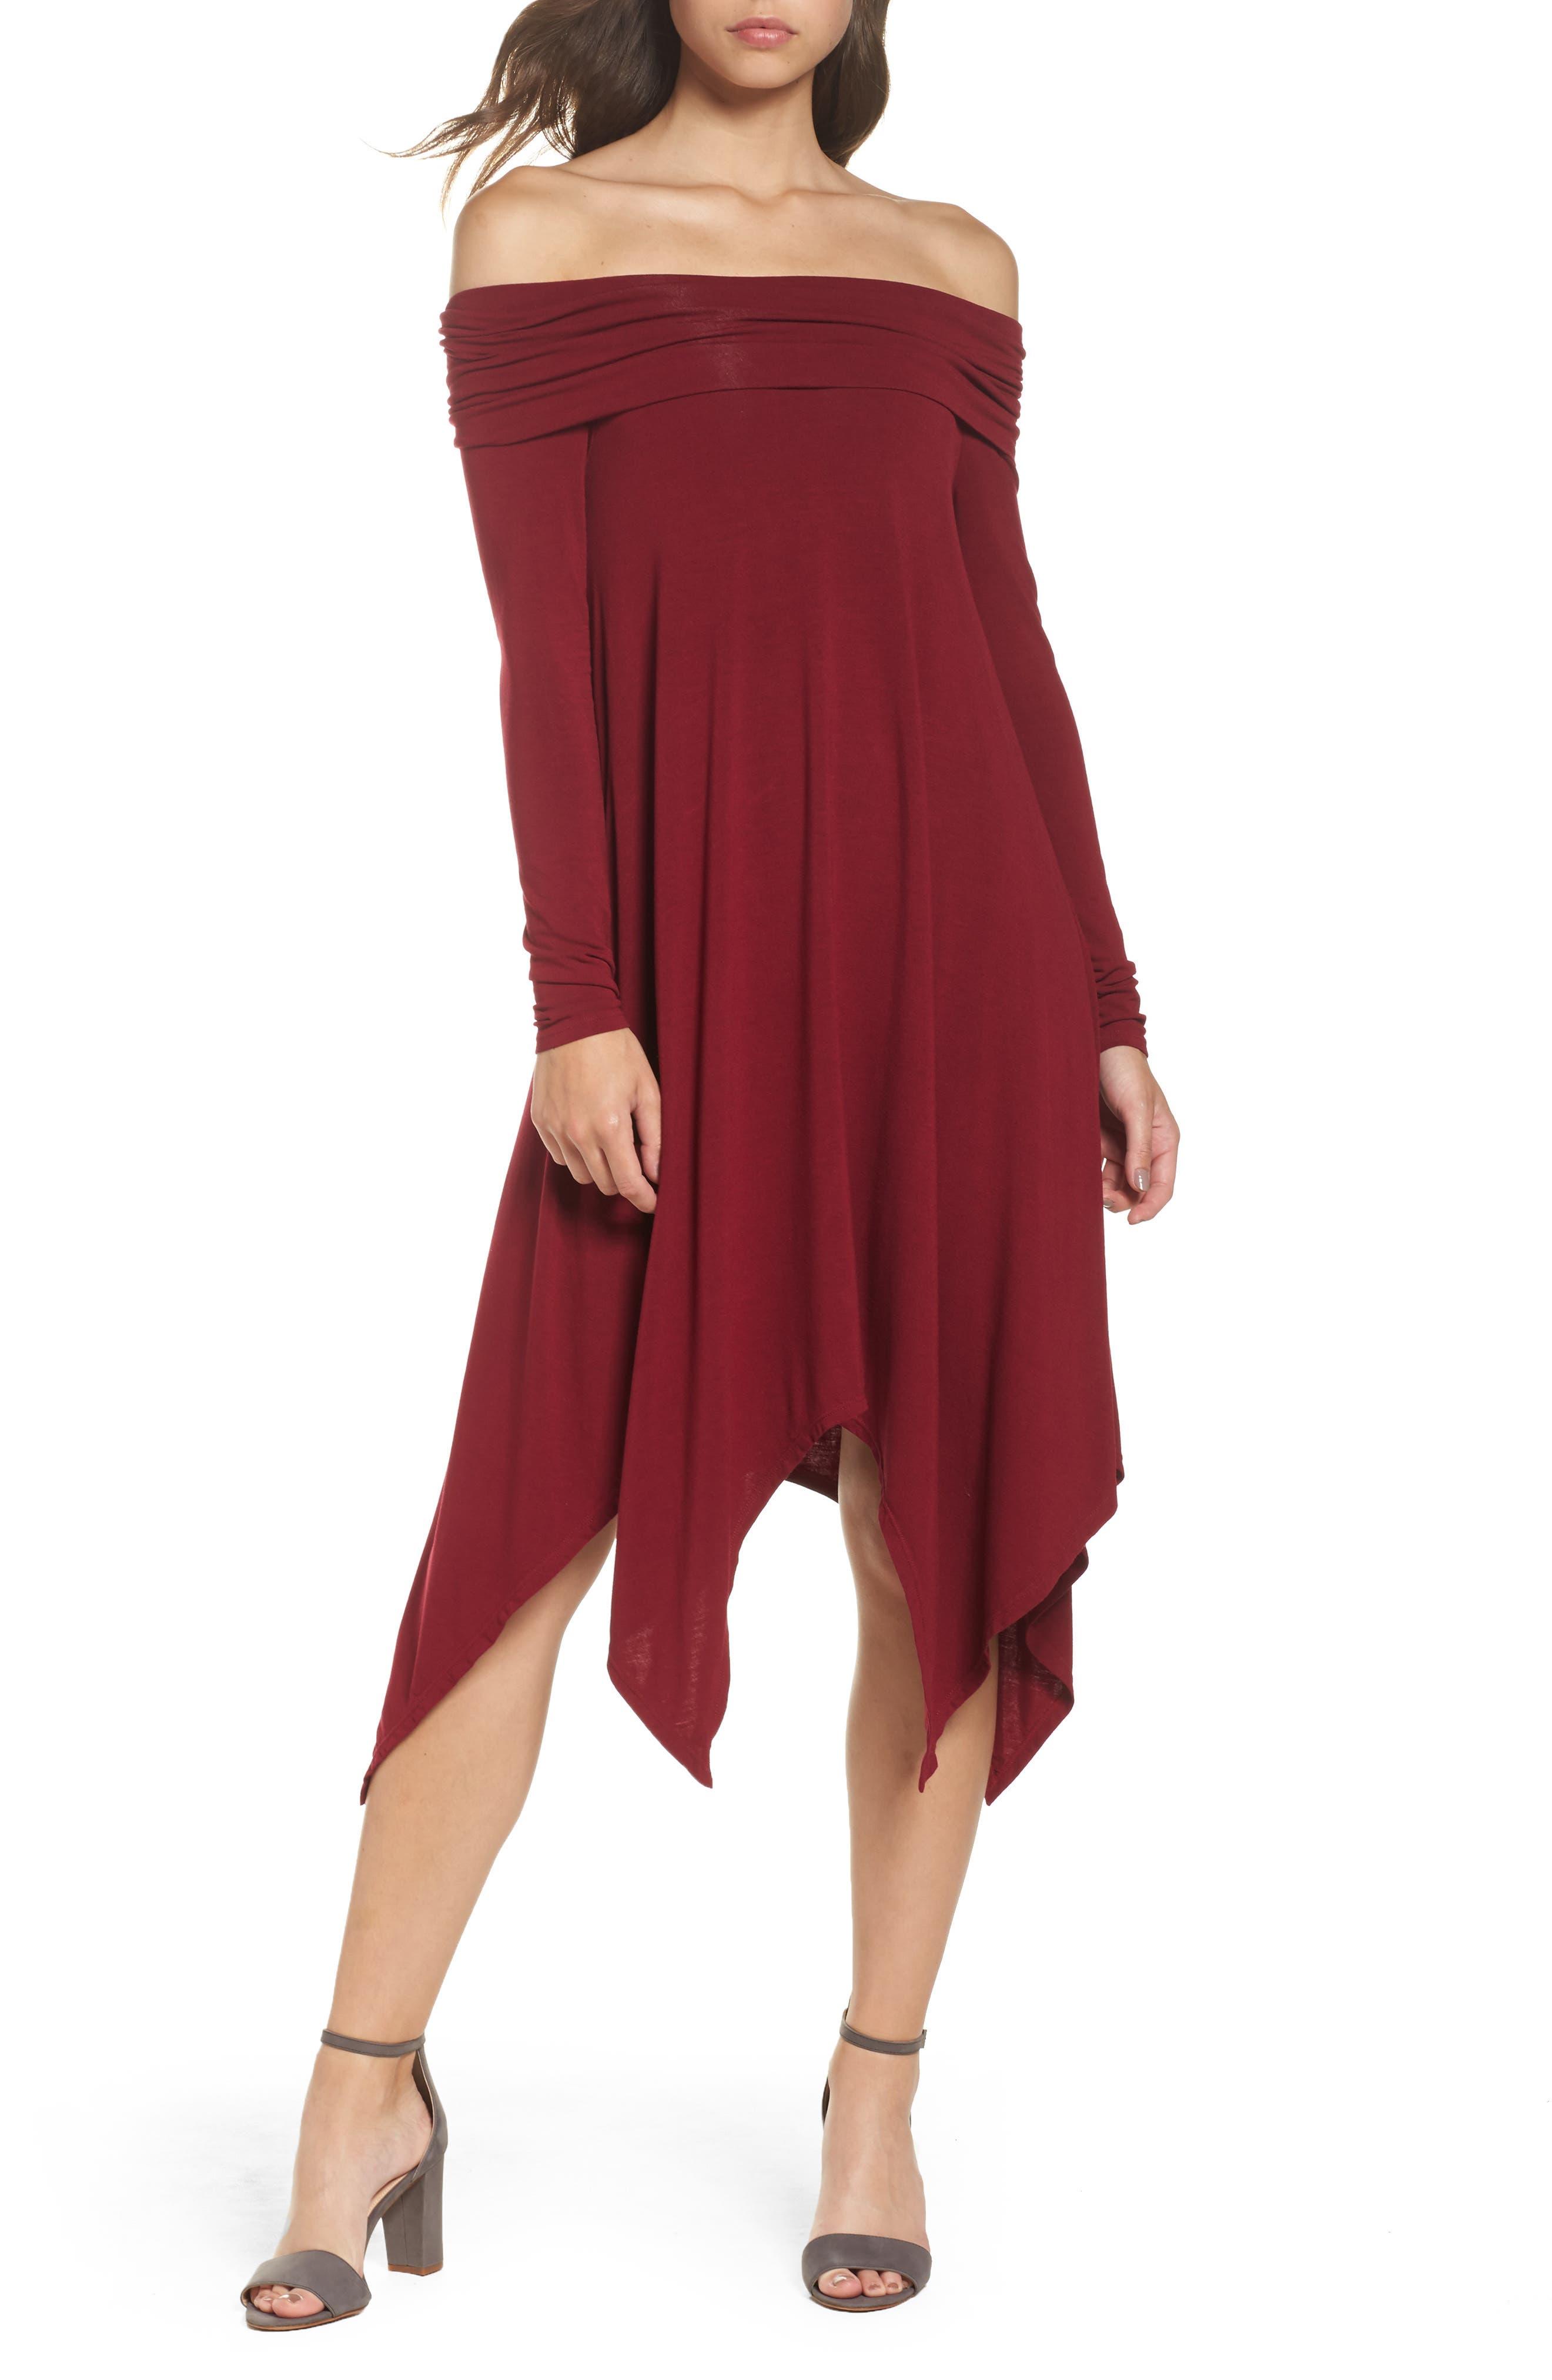 Main Image - BCBGMAXAZRIA Off the Shoulder Knit A-Line Dress